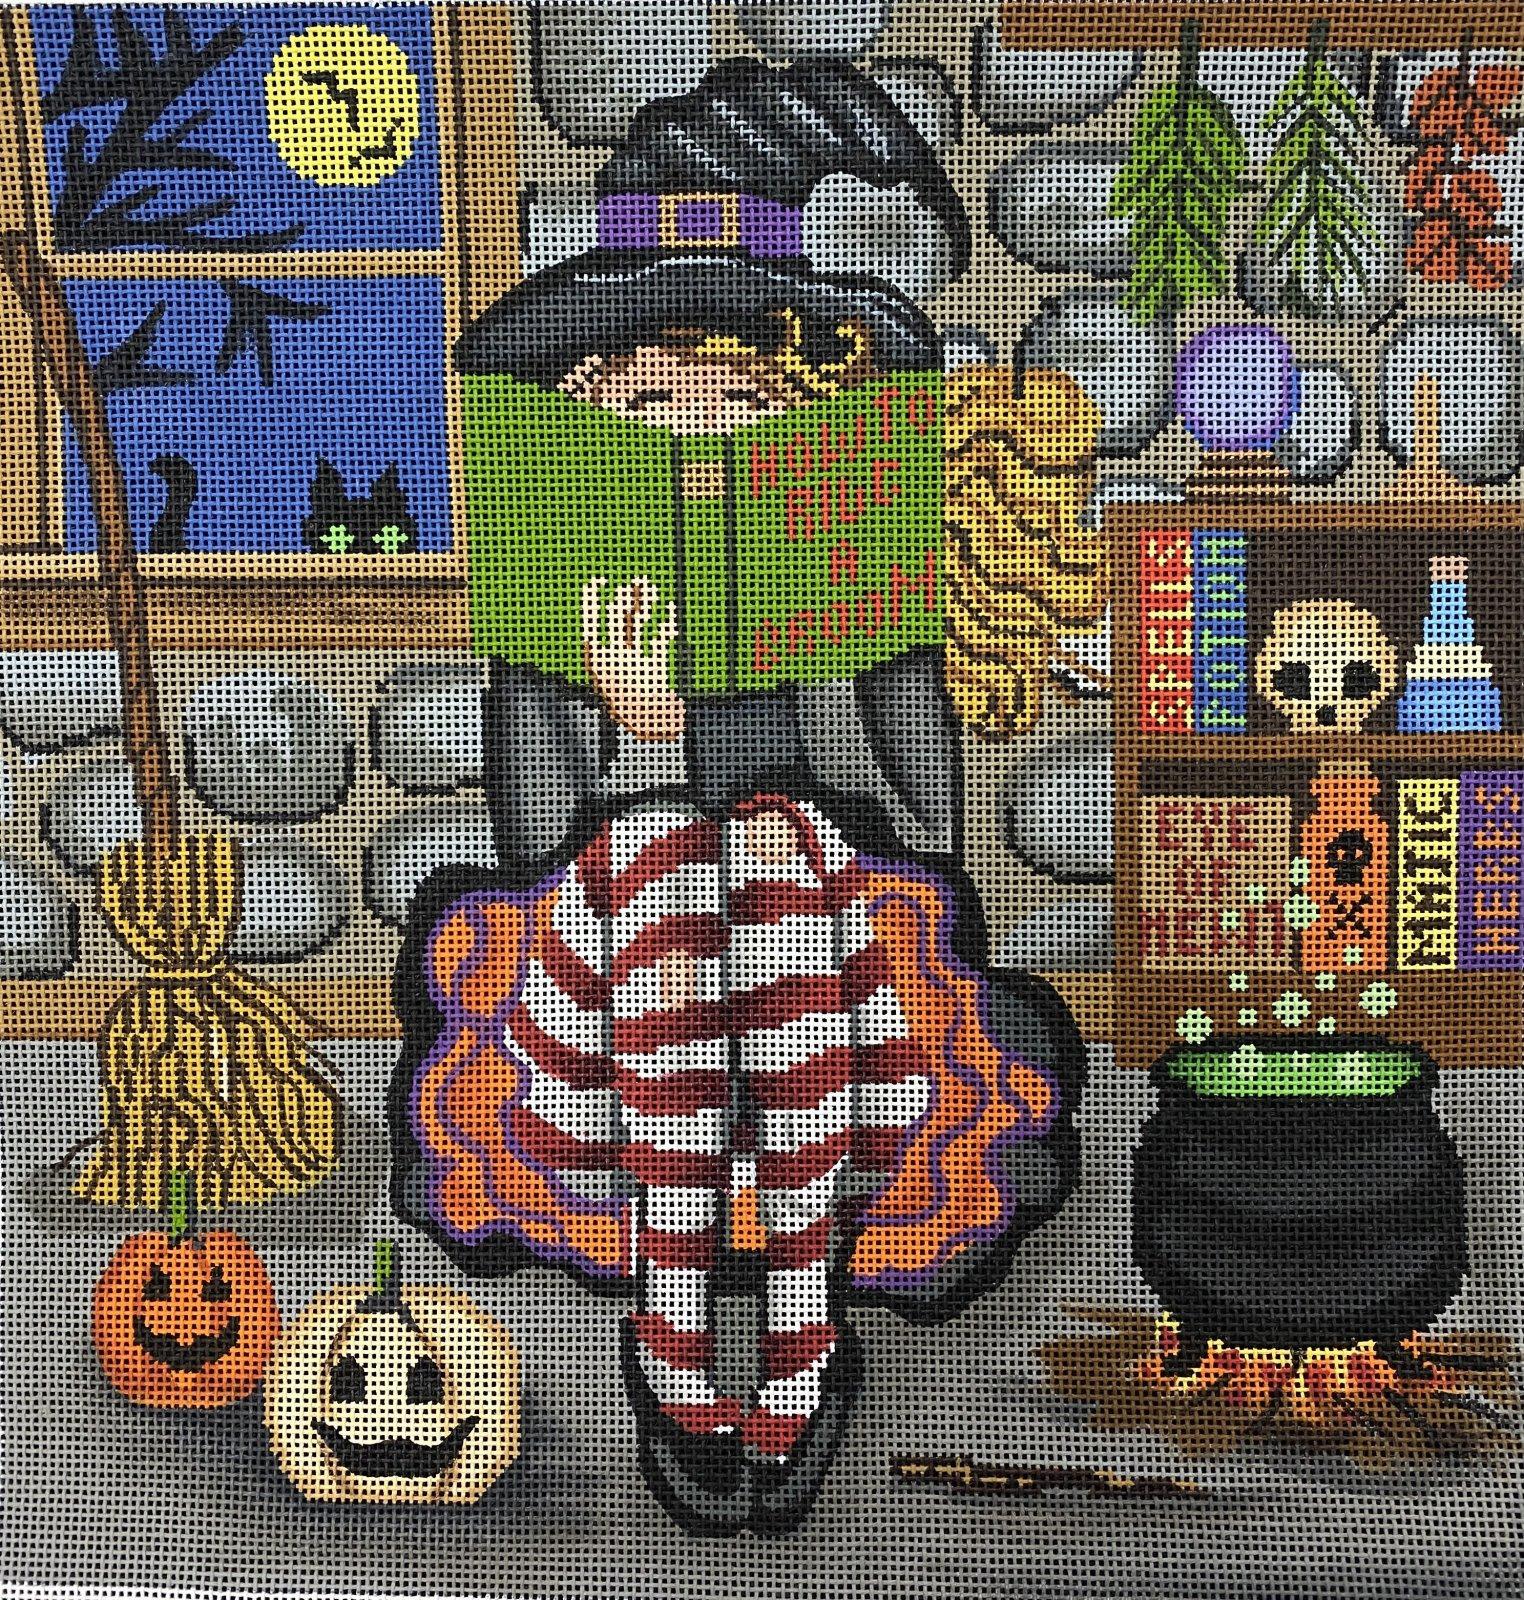 Girl Stitching Witch,18 ct.,10x10